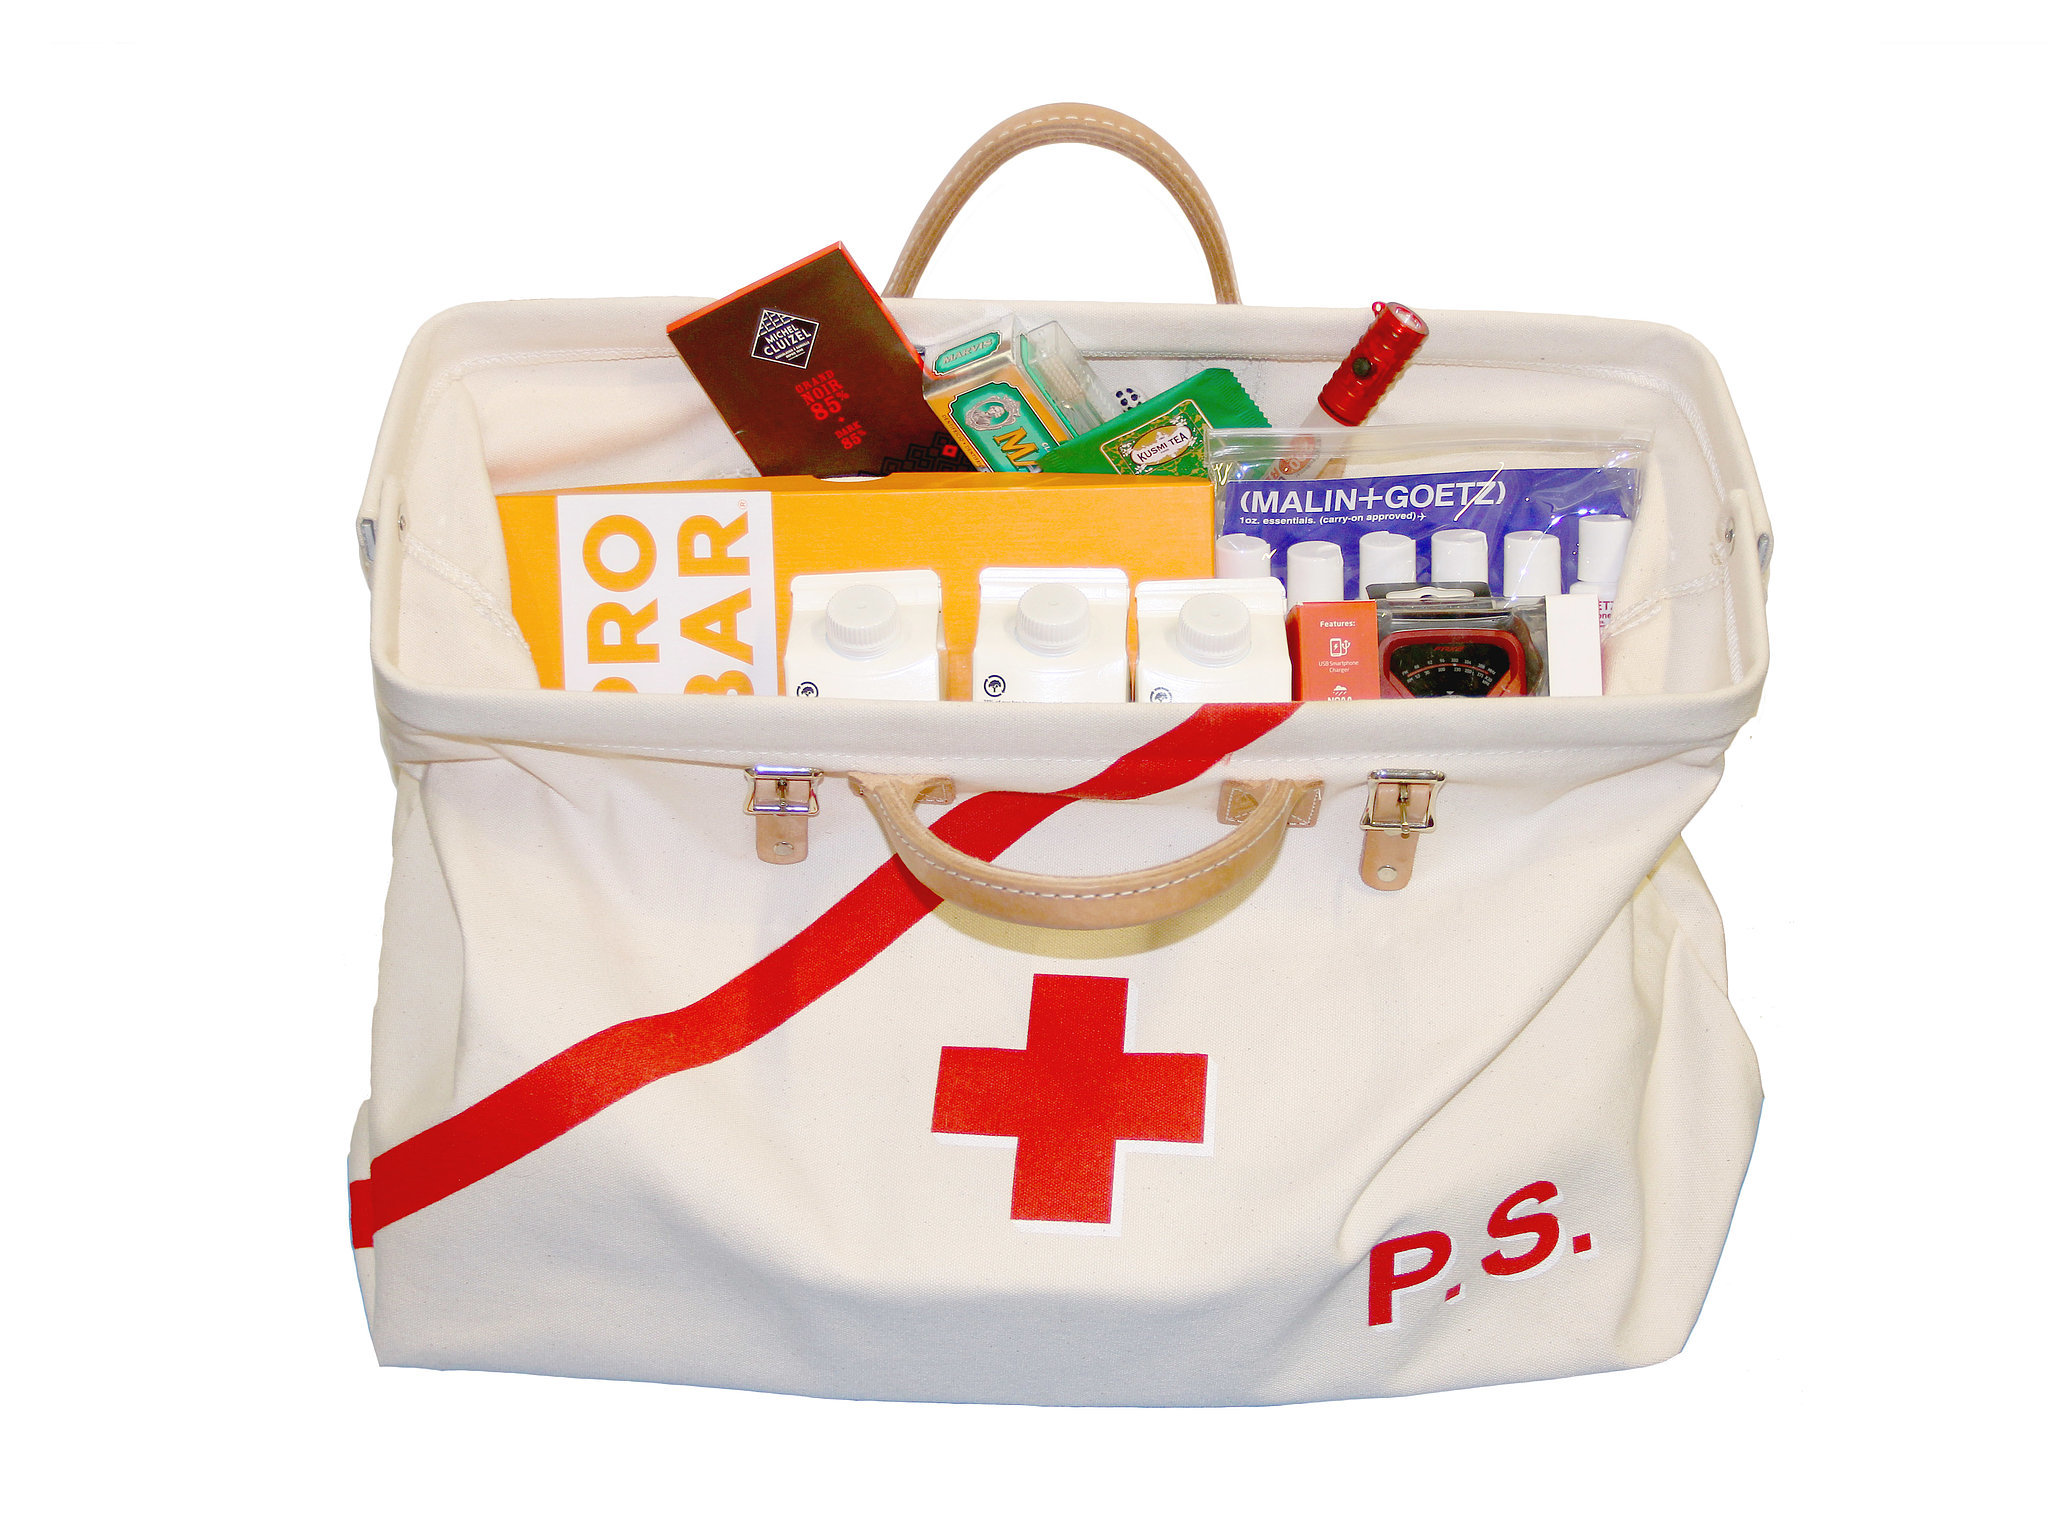 Monogrammed Survival Kit by Preppi